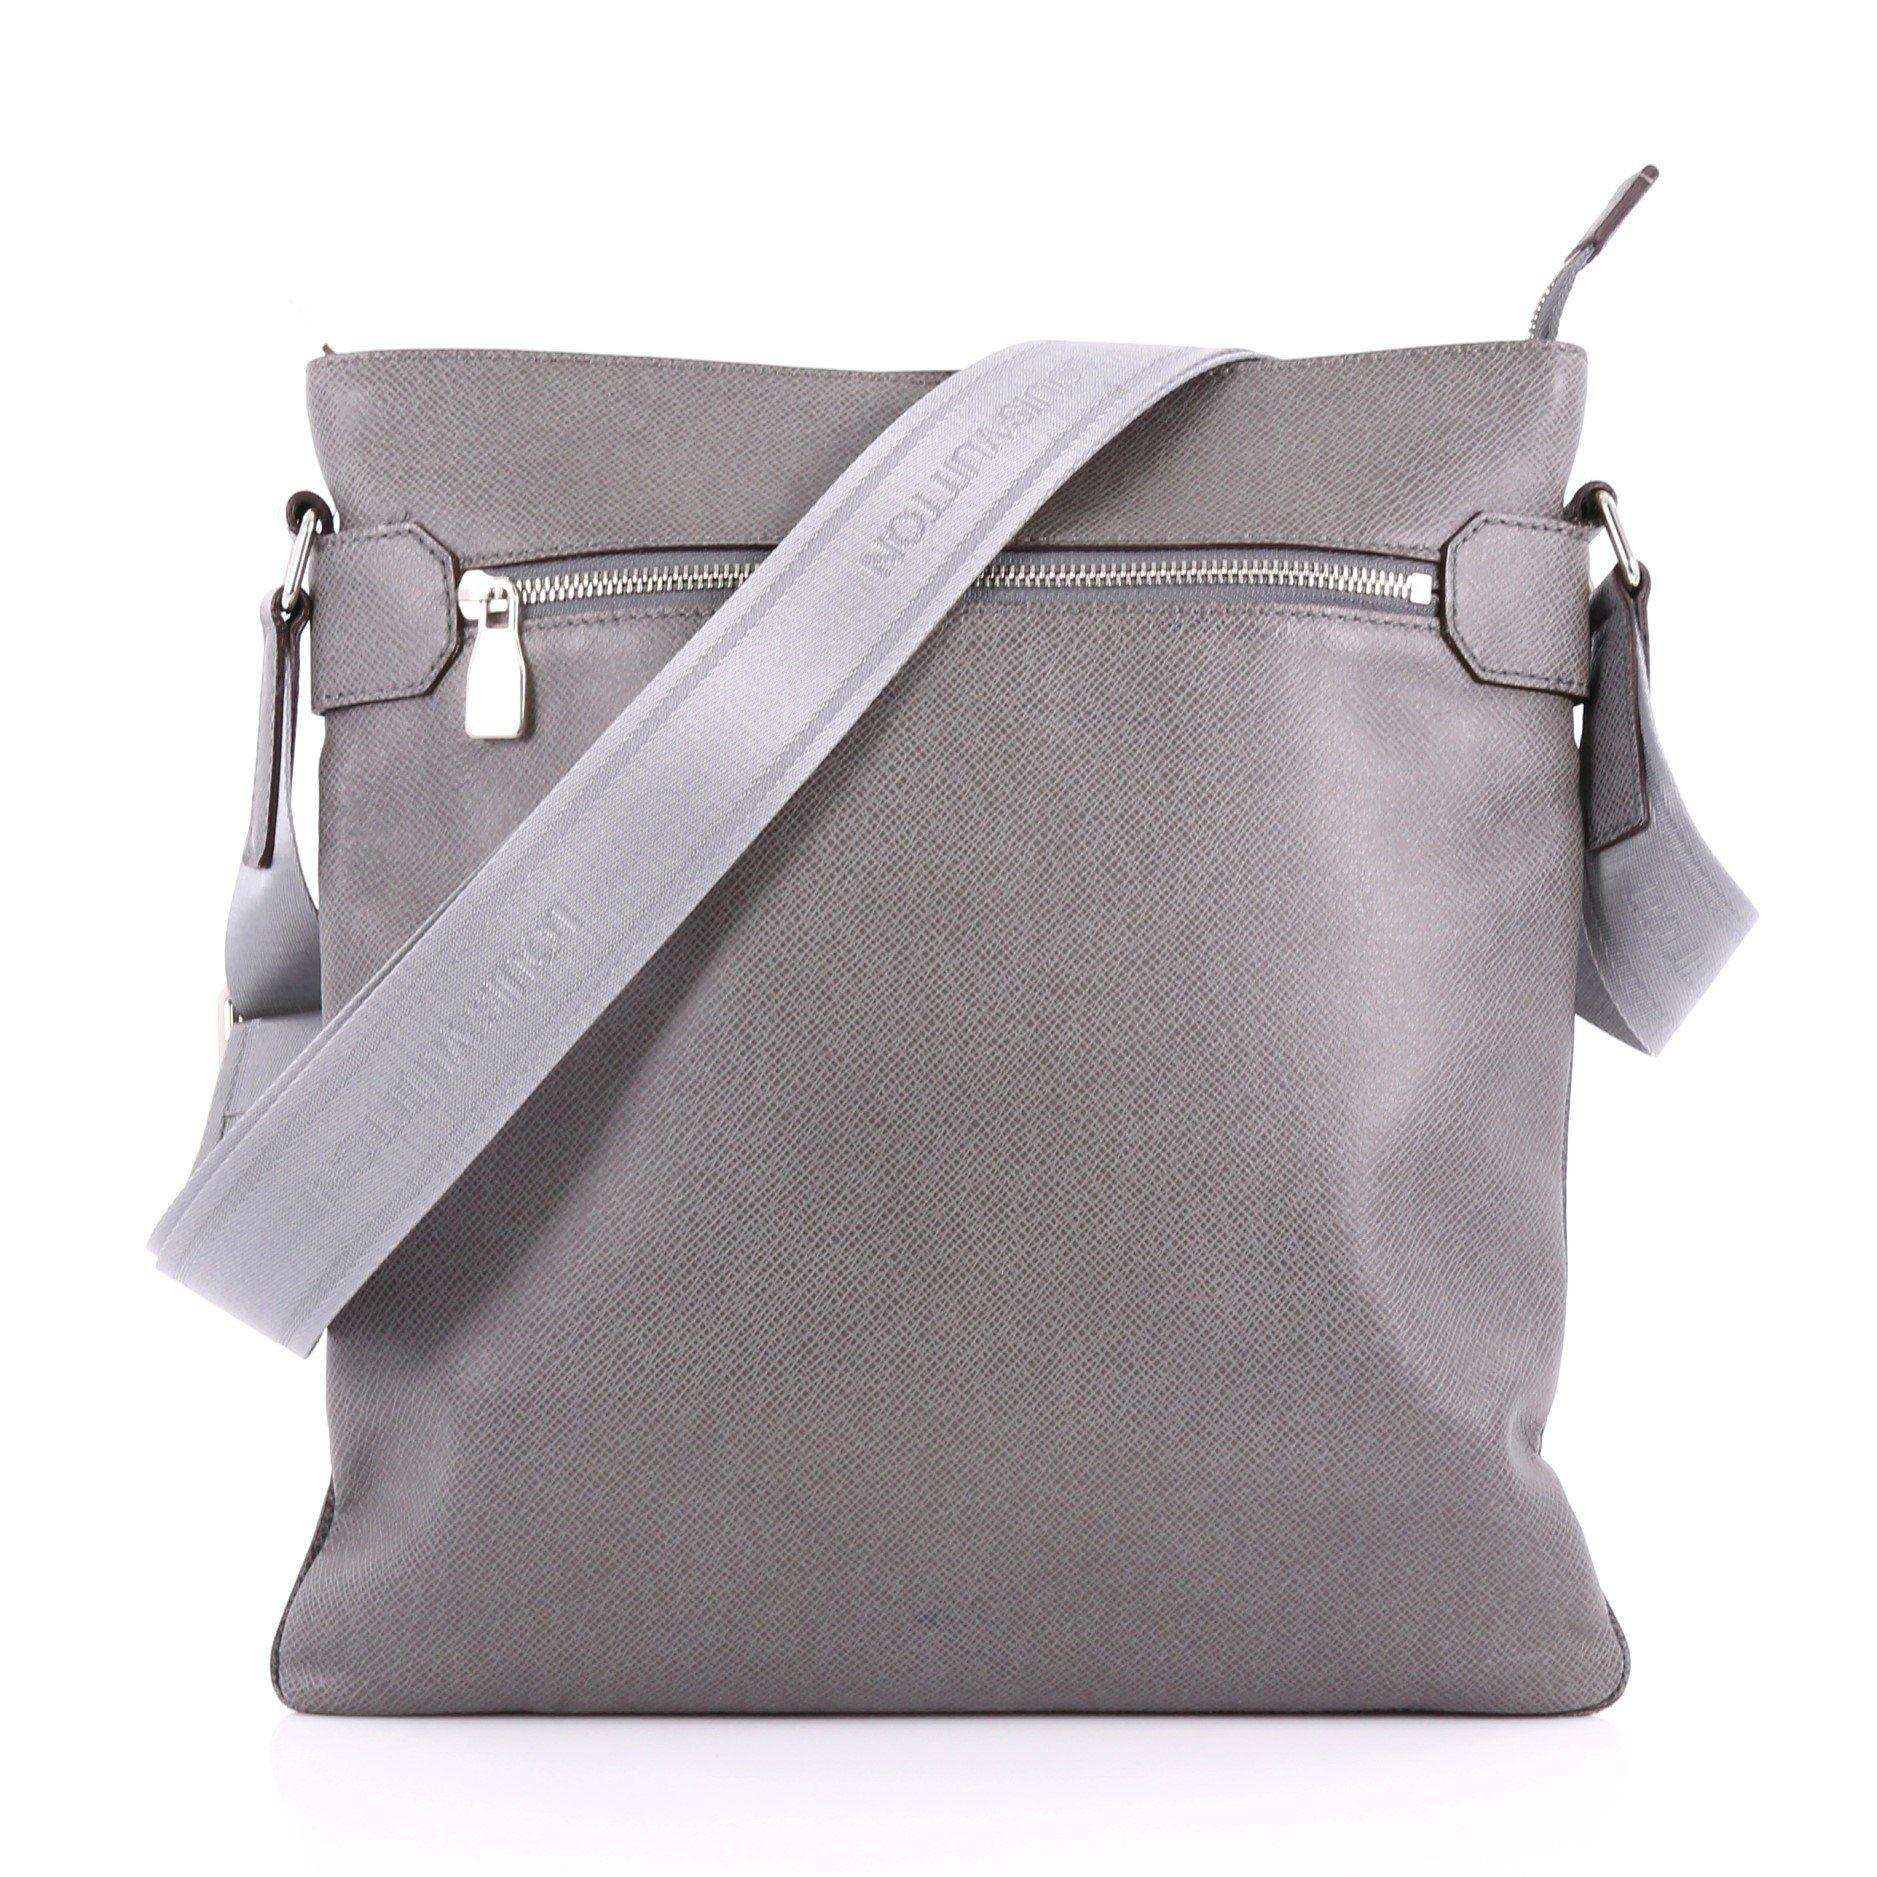 Lyst - Louis Vuitton Pre Owned Sasha Handbag Taiga Leather in Gray eef82b08763c6